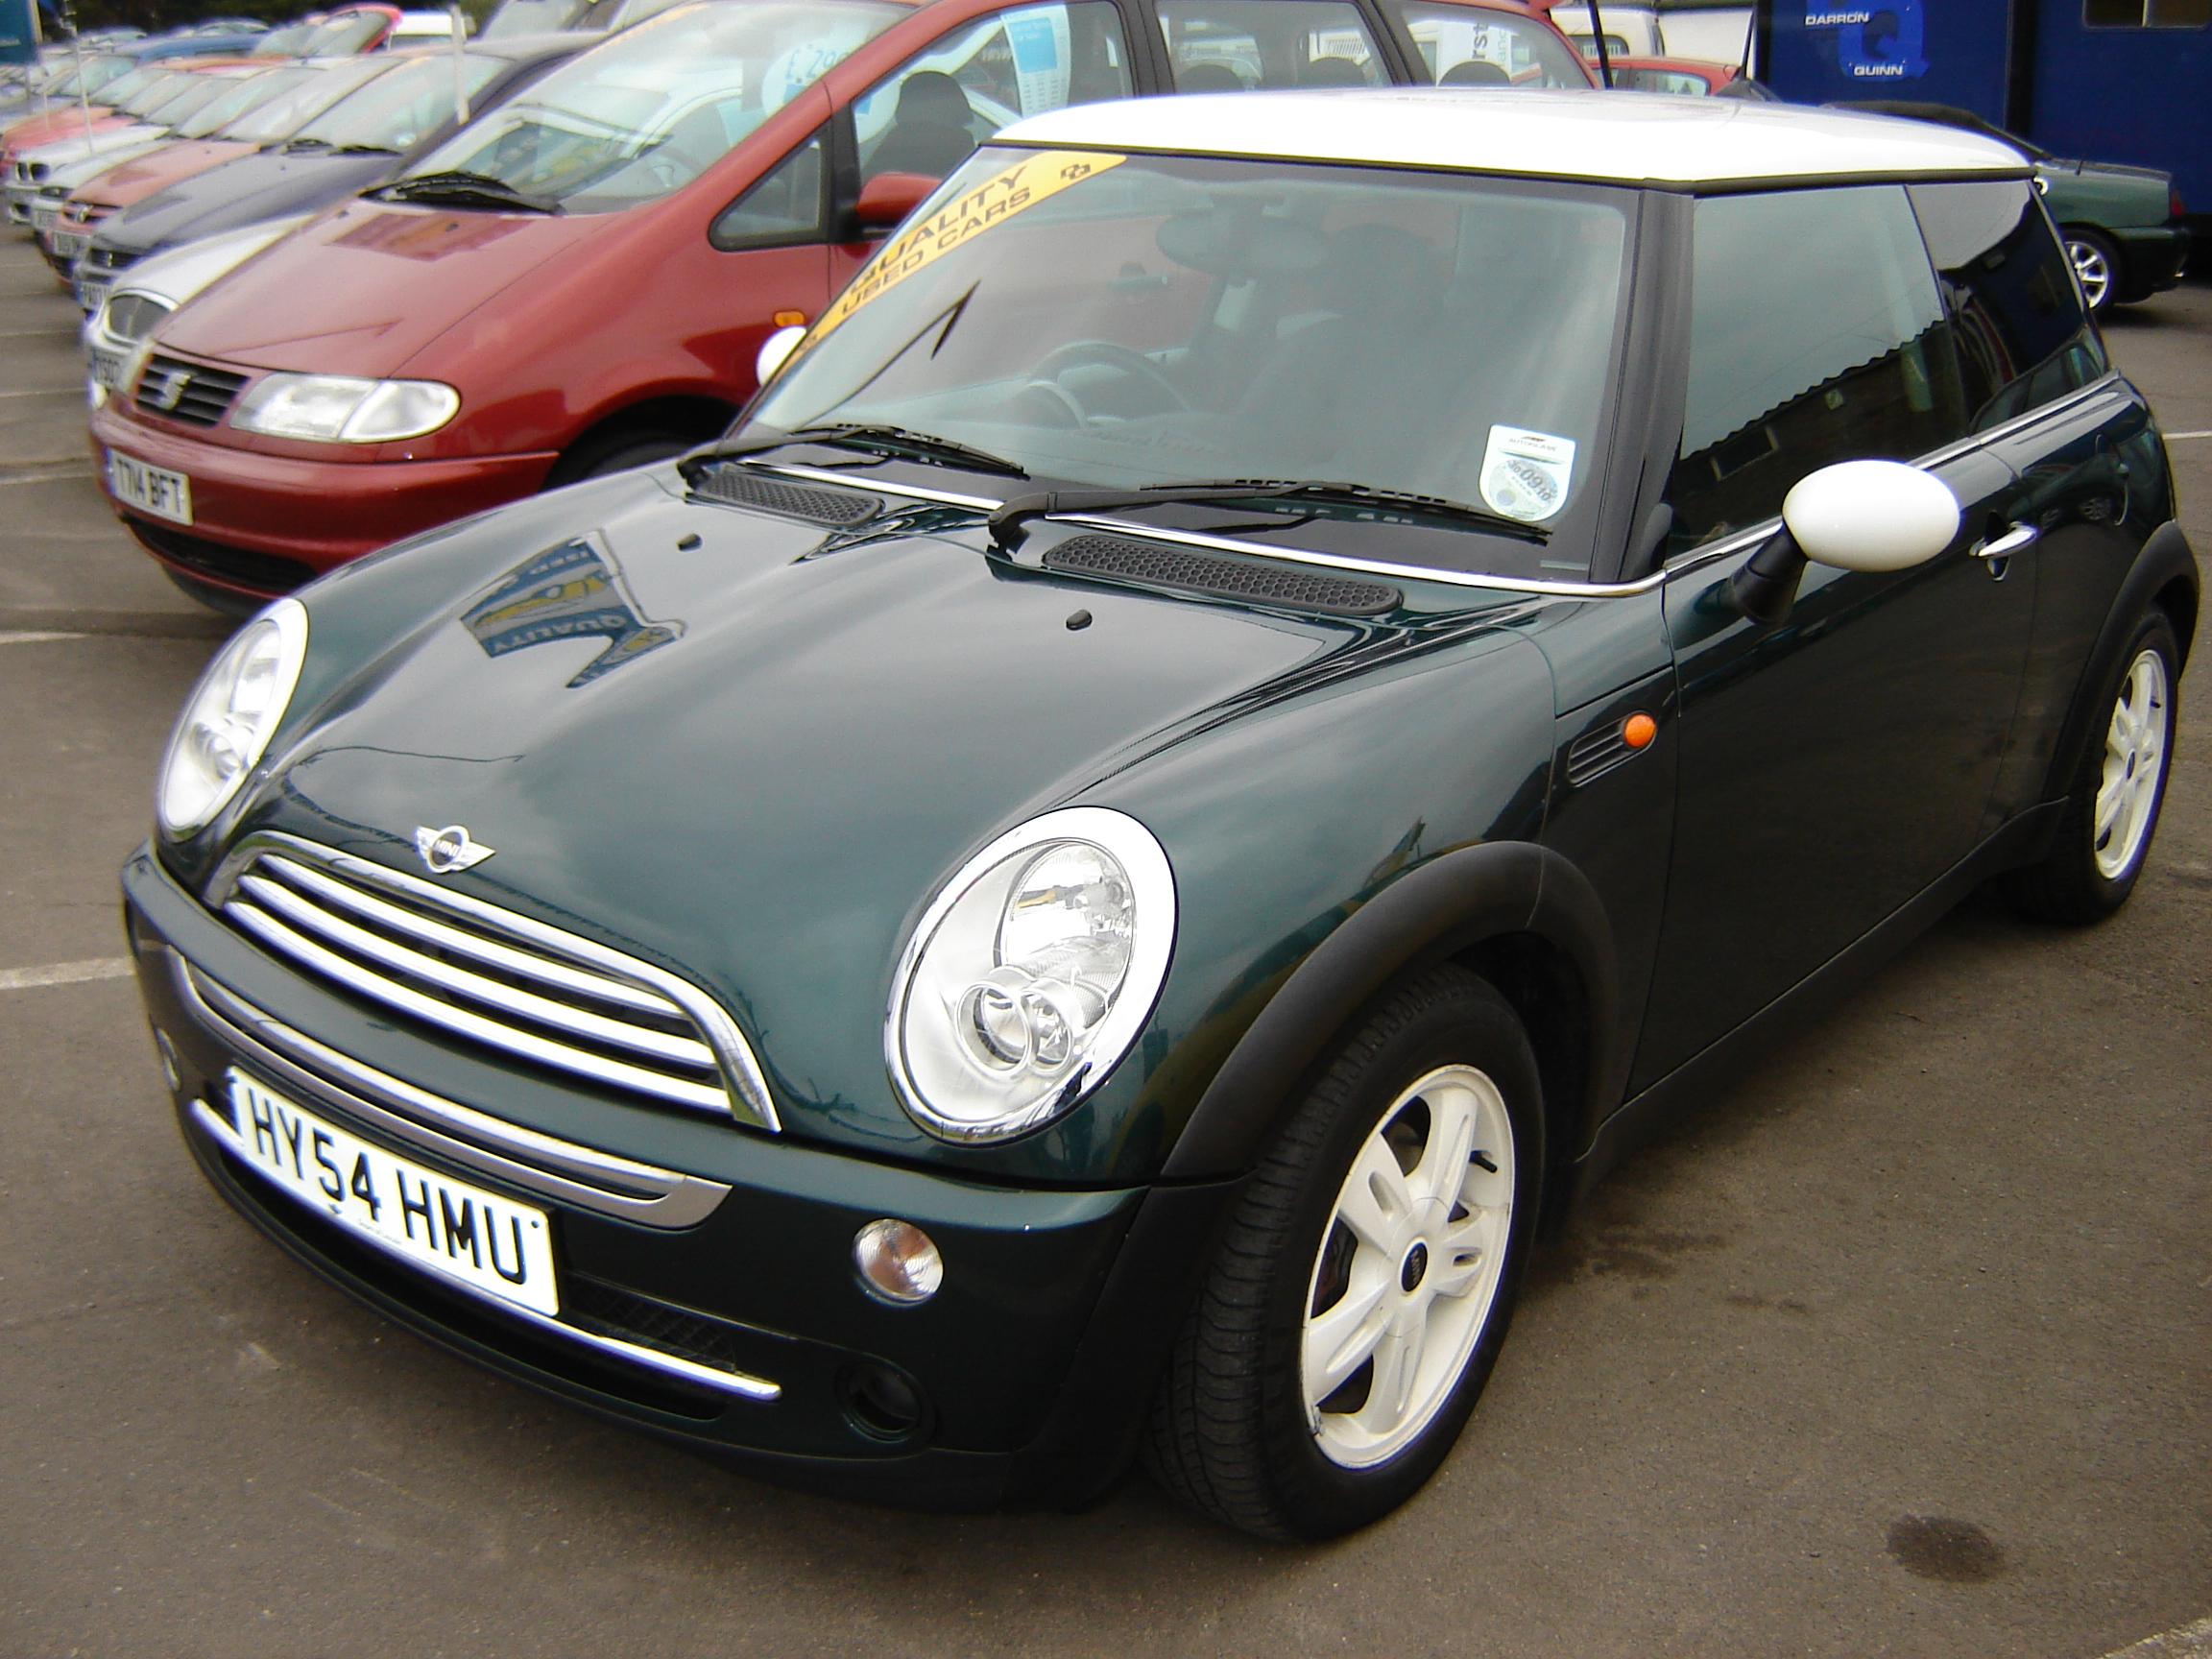 purchase usedcar vegas an Inexpensive Option